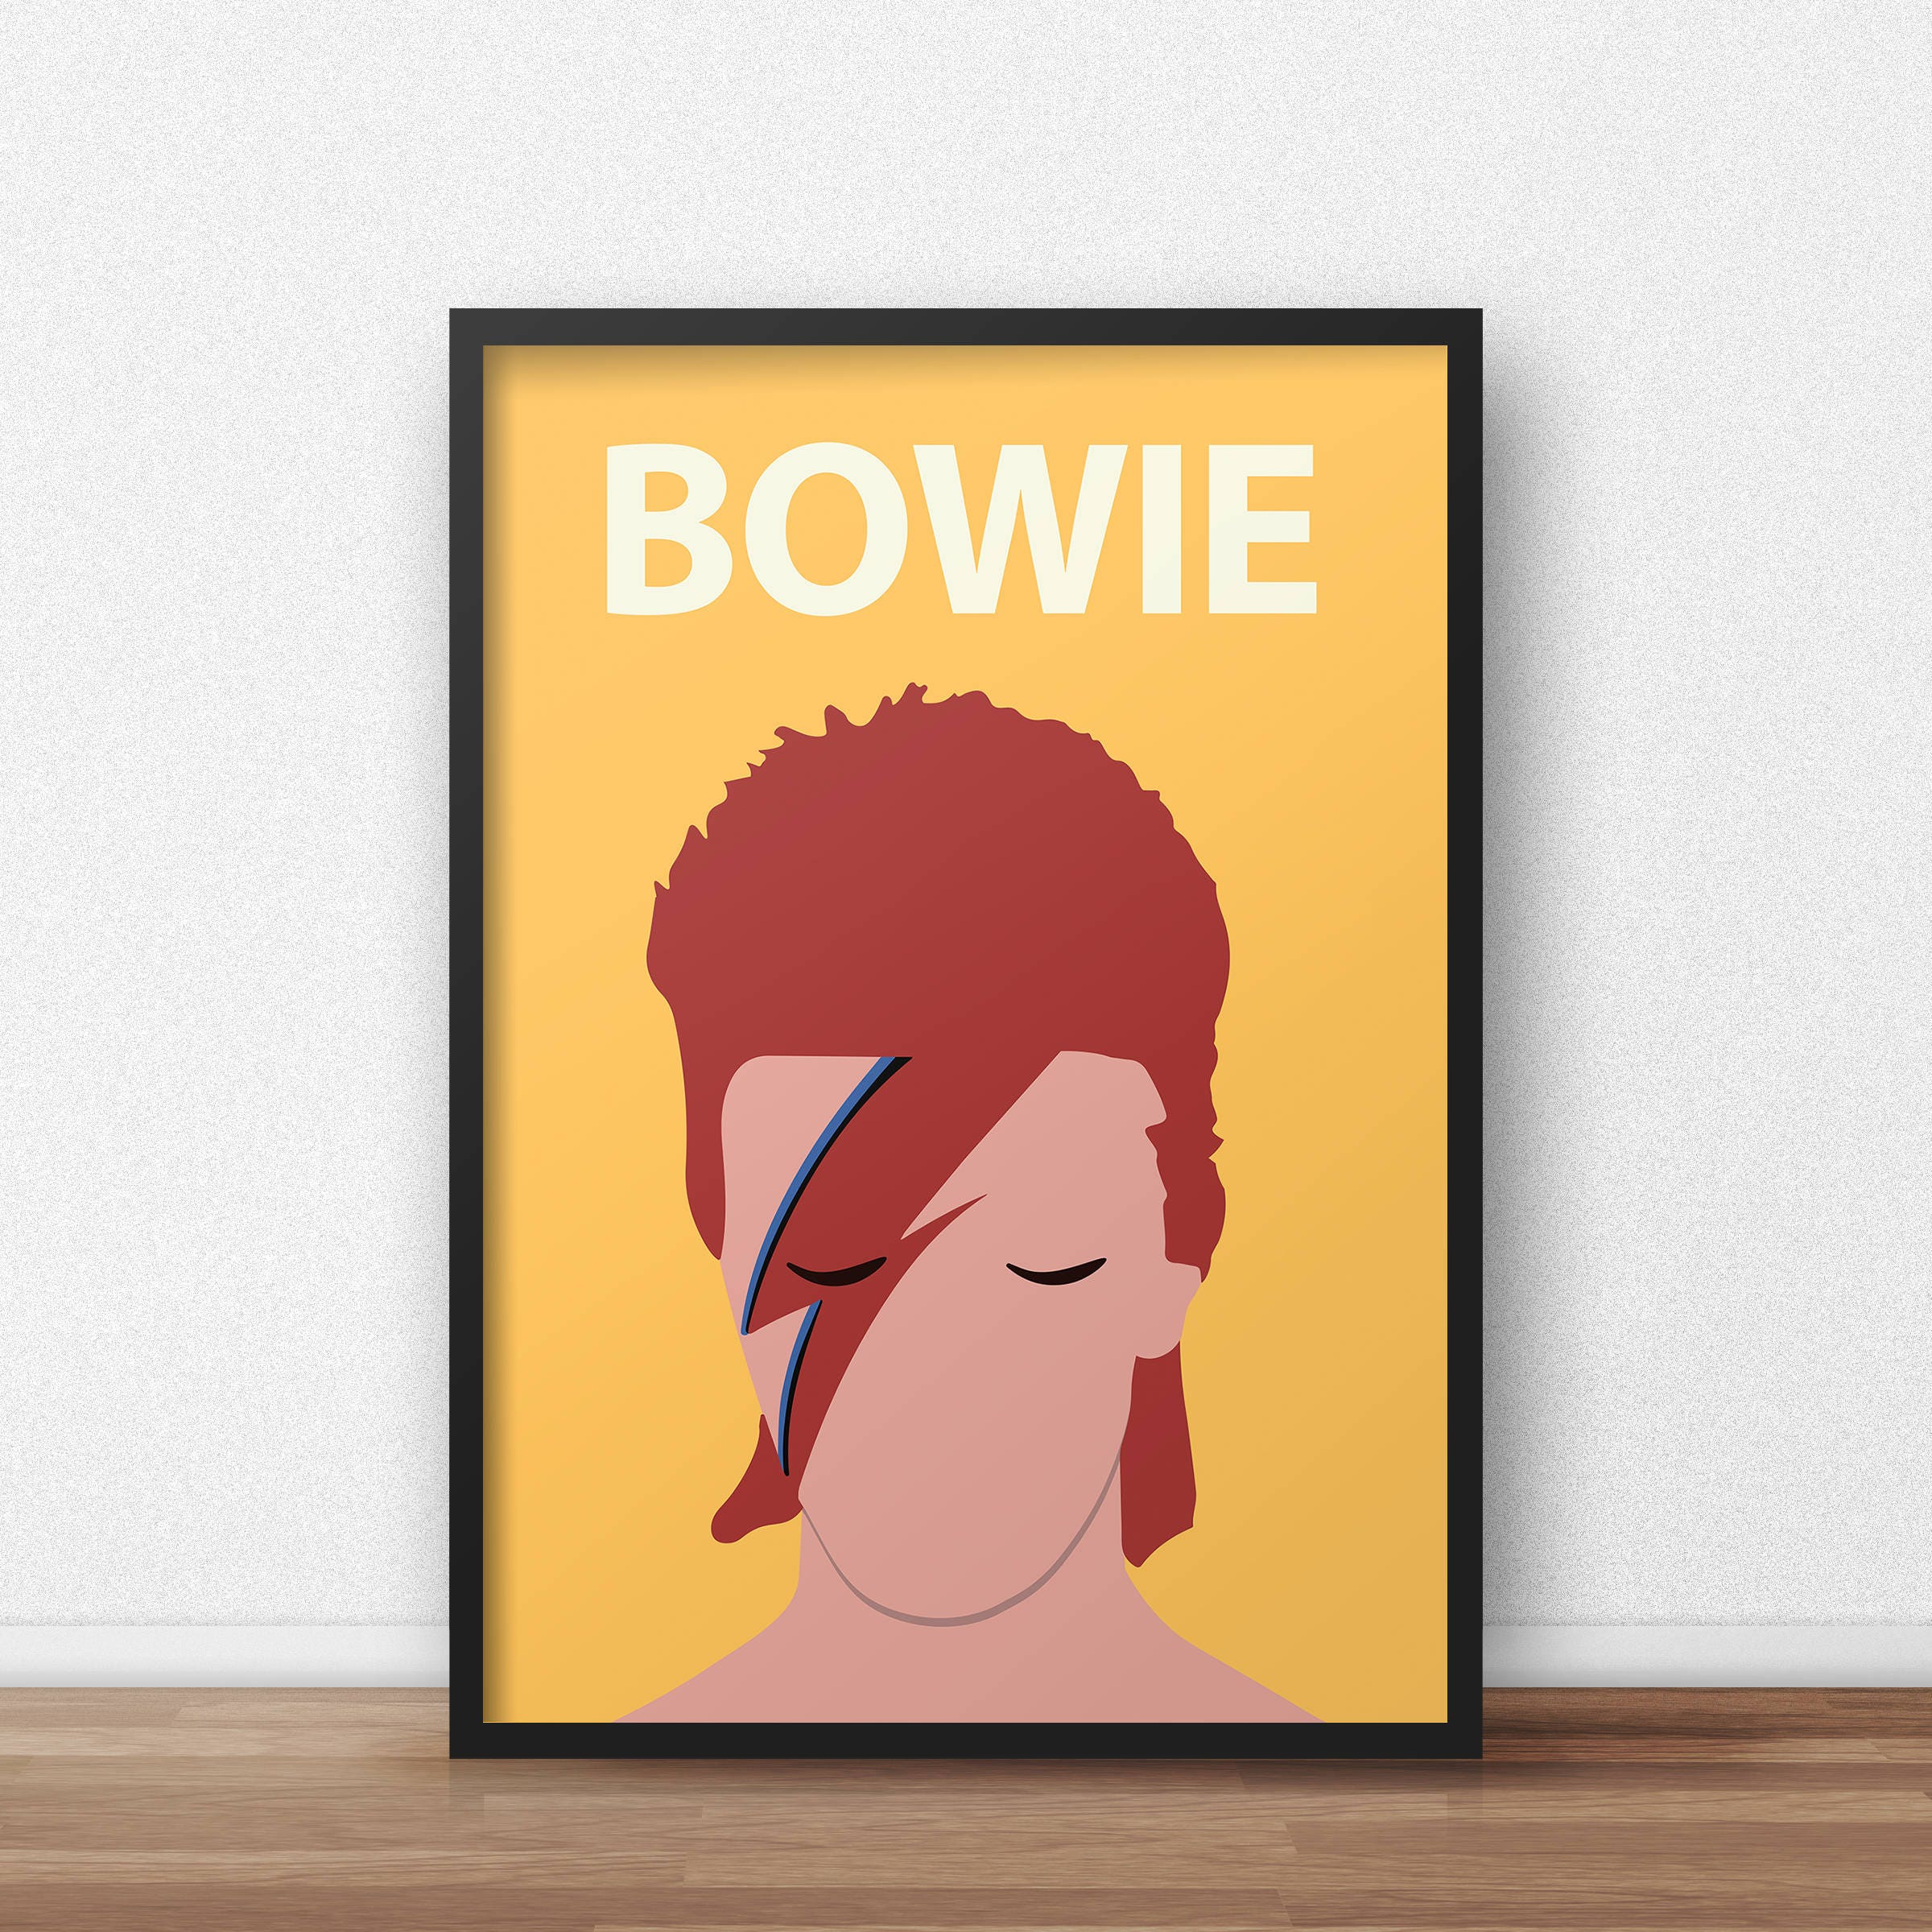 David Bowie / Ziggy Stardust Poster Print // Minimalist Print | Etsy